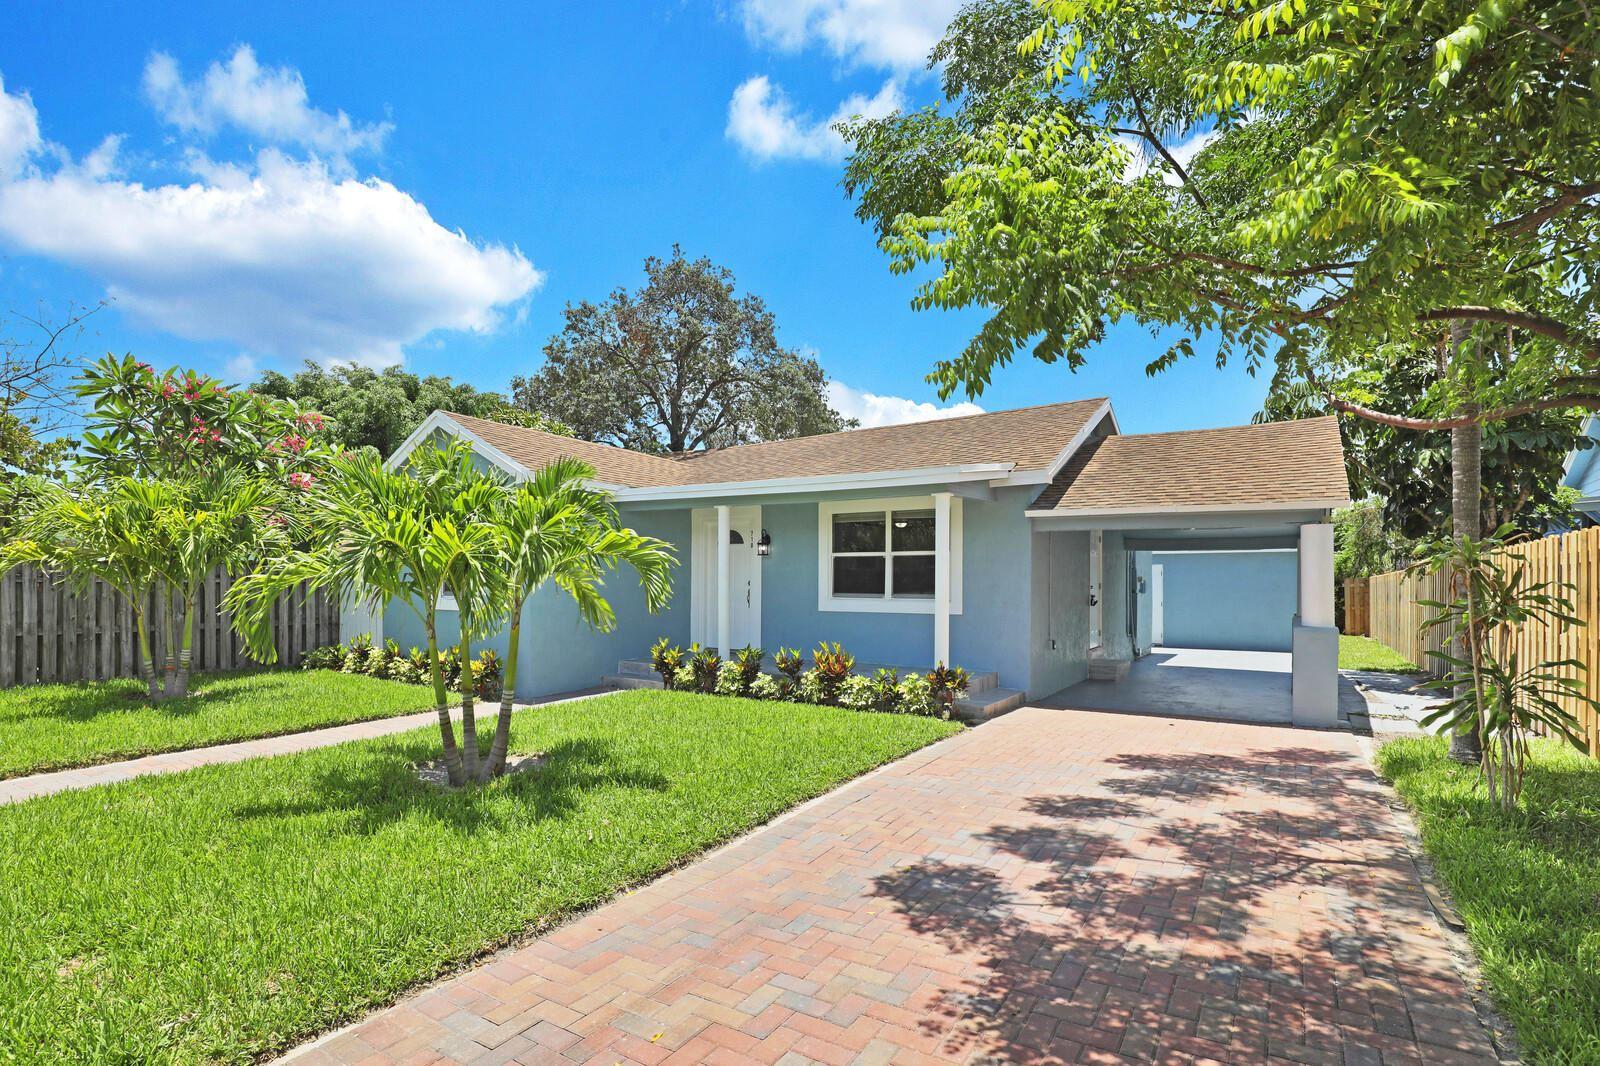 710 W Lakewood Road, West Palm Beach, FL 33405 - MLS#: RX-10729125